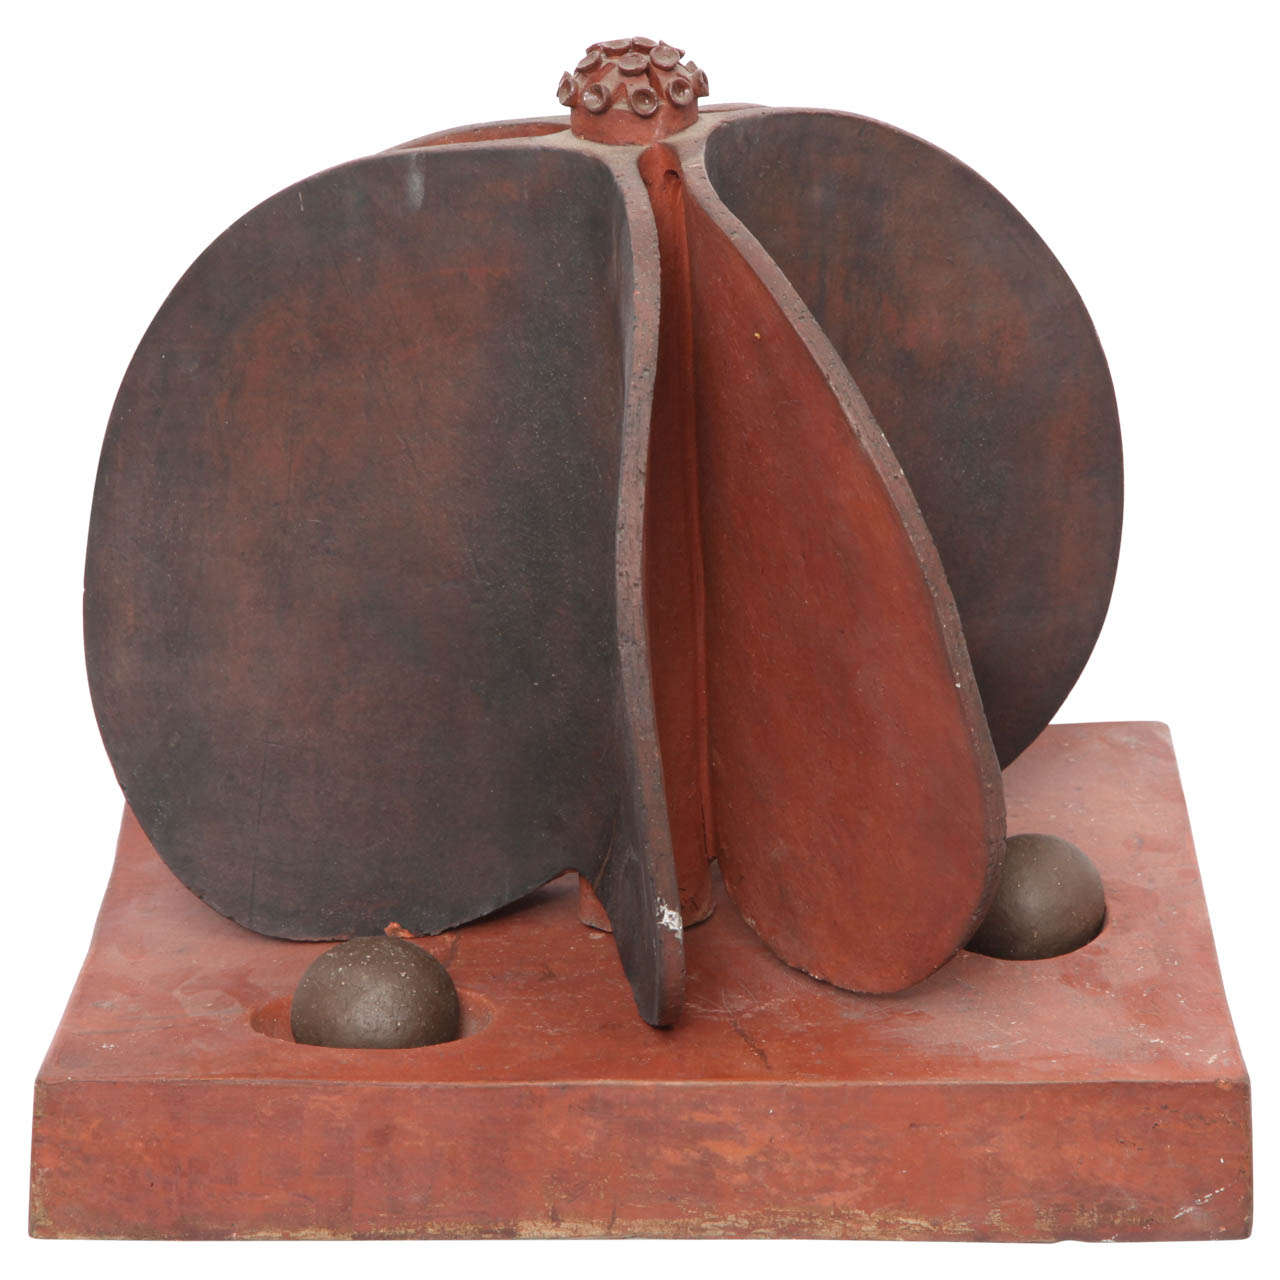 1980s Ceramic Sculpture Signed Marilyn Fox